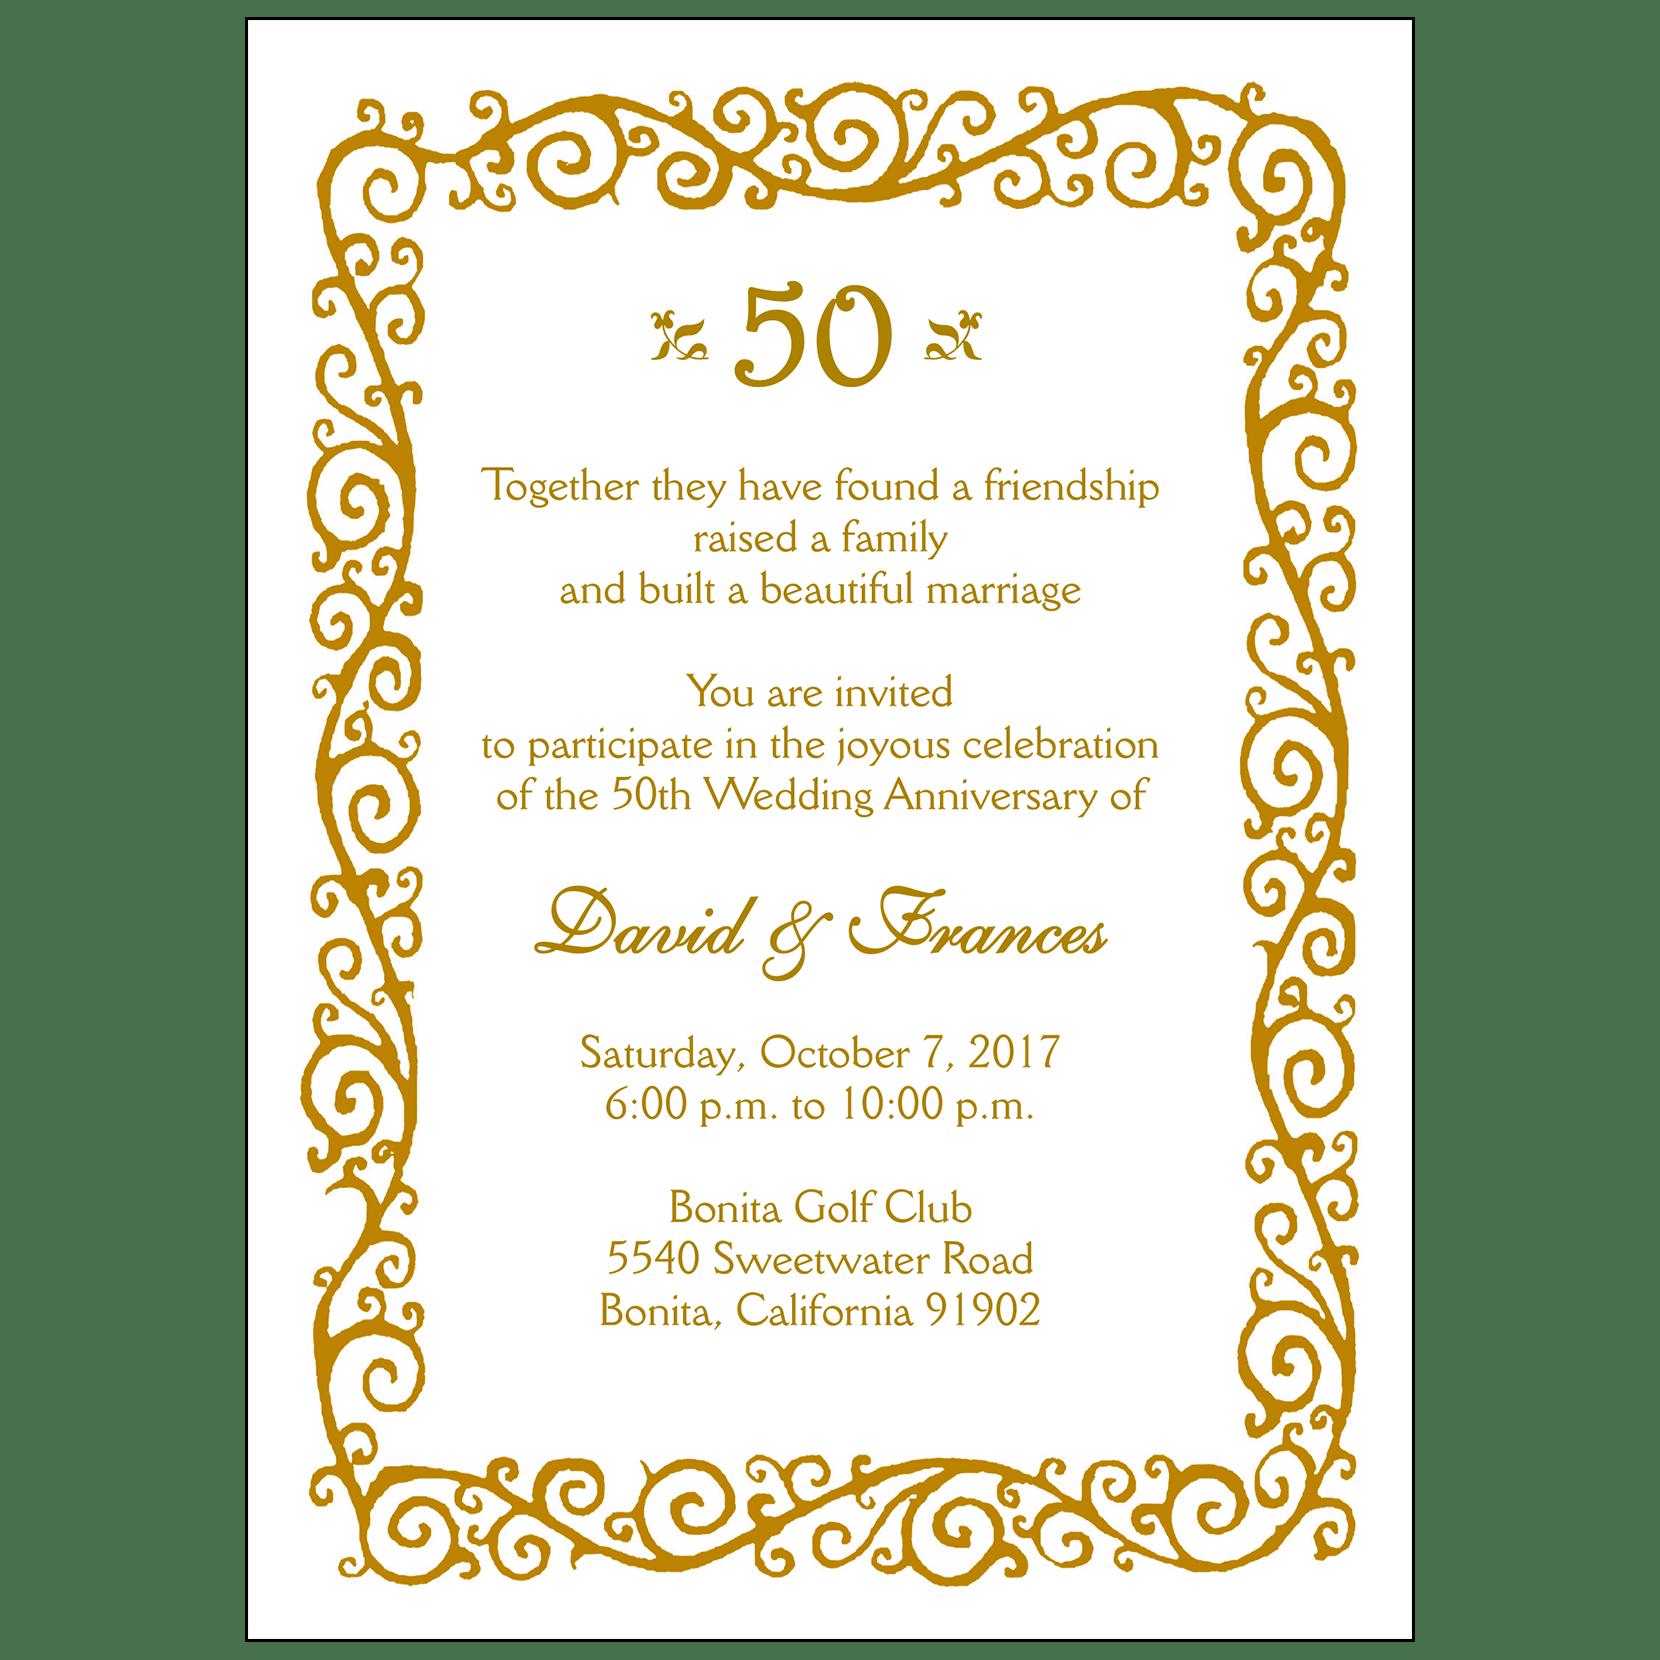 50th anniversary party invitations joselinohouse recent posts stopboris Gallery